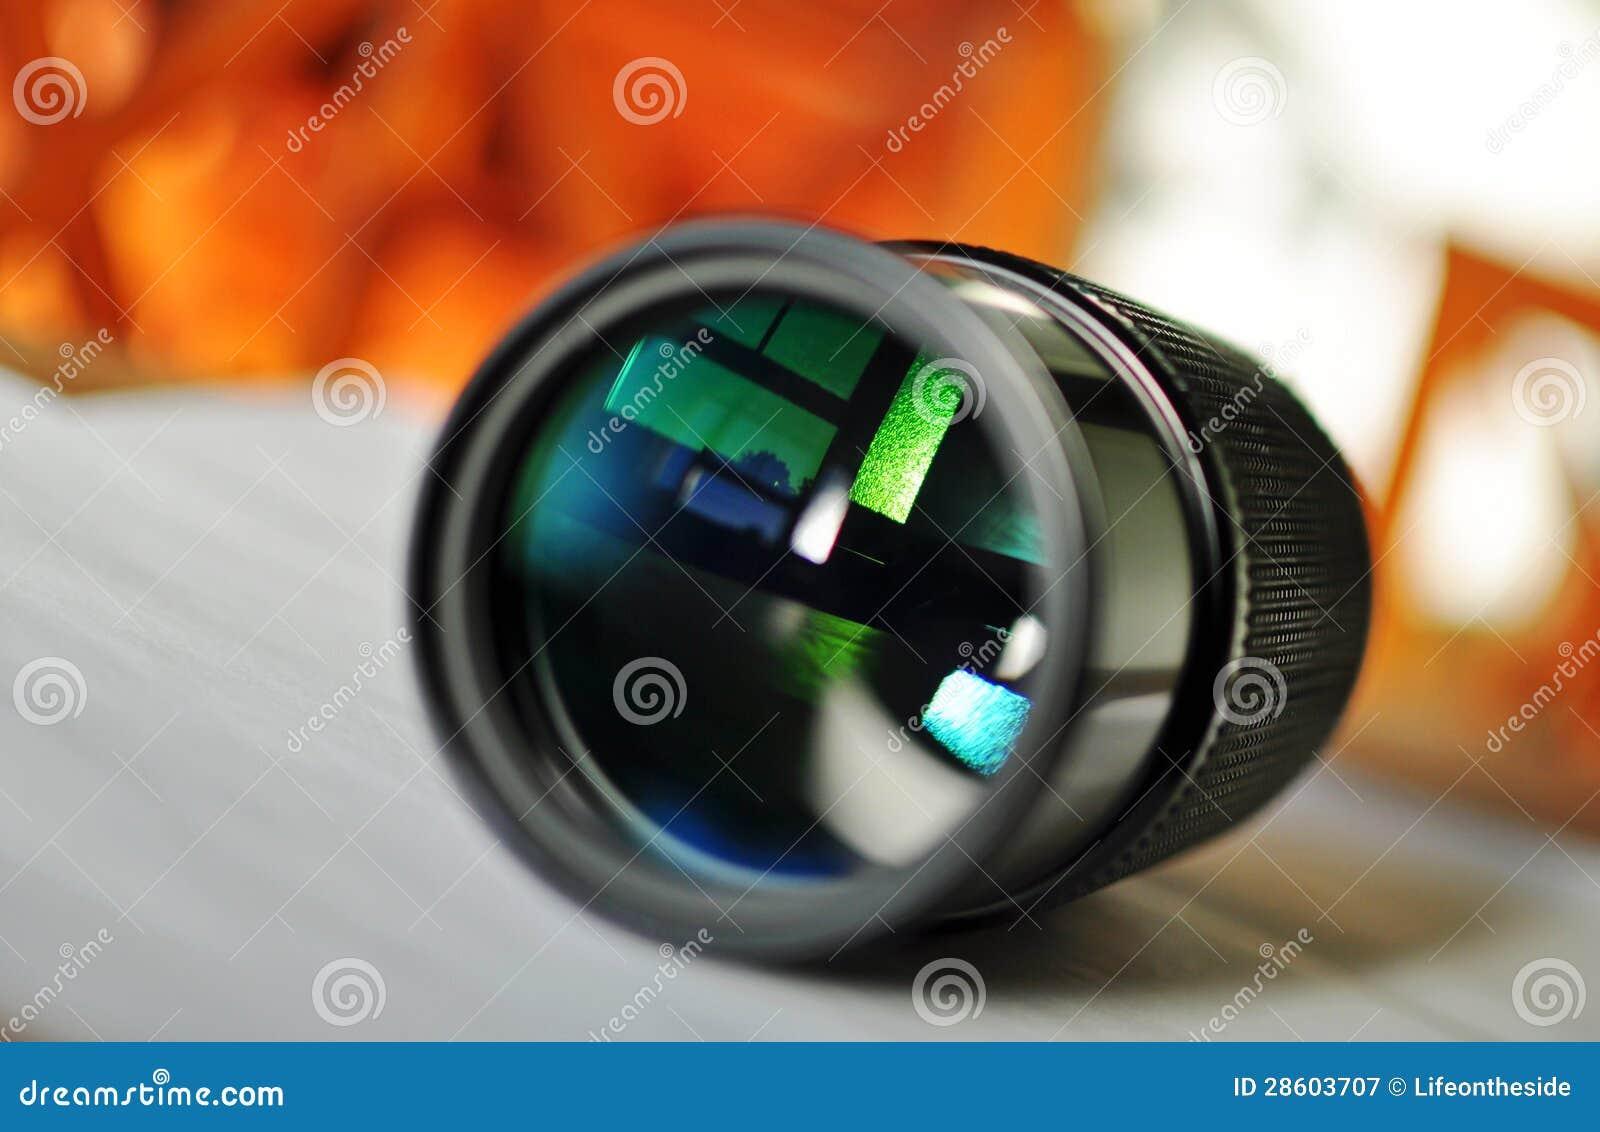 of a slr camera zoom lens Video Camera Lens Reflection